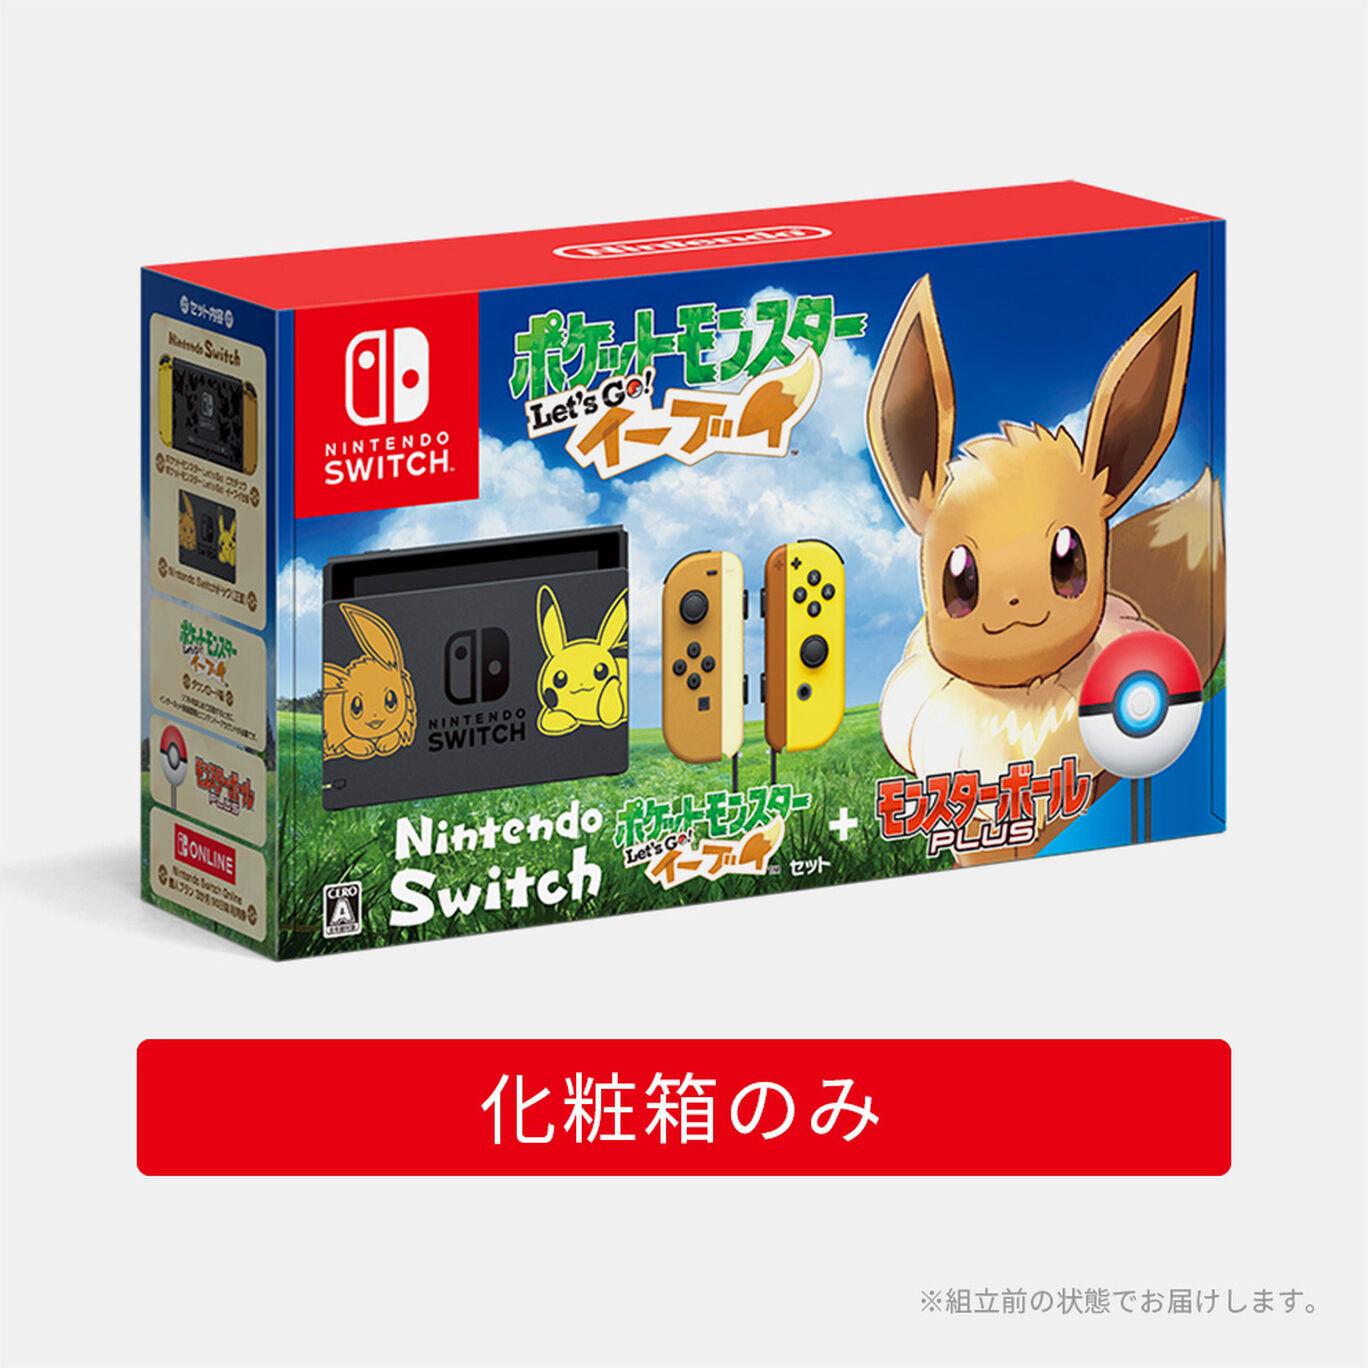 Nintendo Switch ポケットモンスター Let's Go! イーブイセット 化粧箱